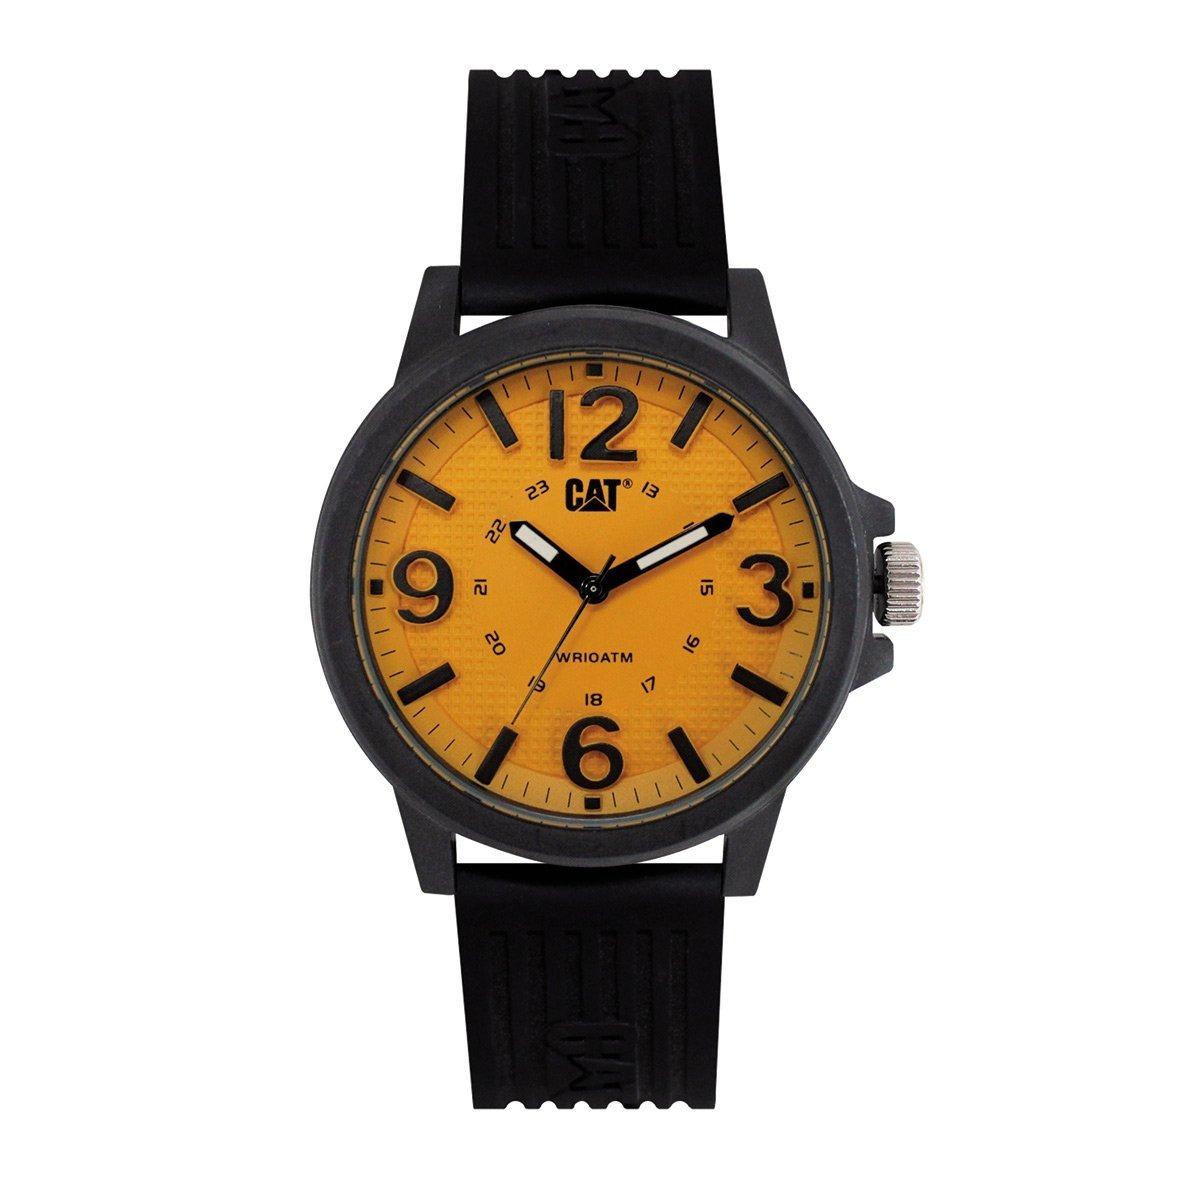 5cedb4a605c Reloj Cat Groovy Lf.111.21.731 Hombre | Envío Gratis - $ 4.695,00 ...